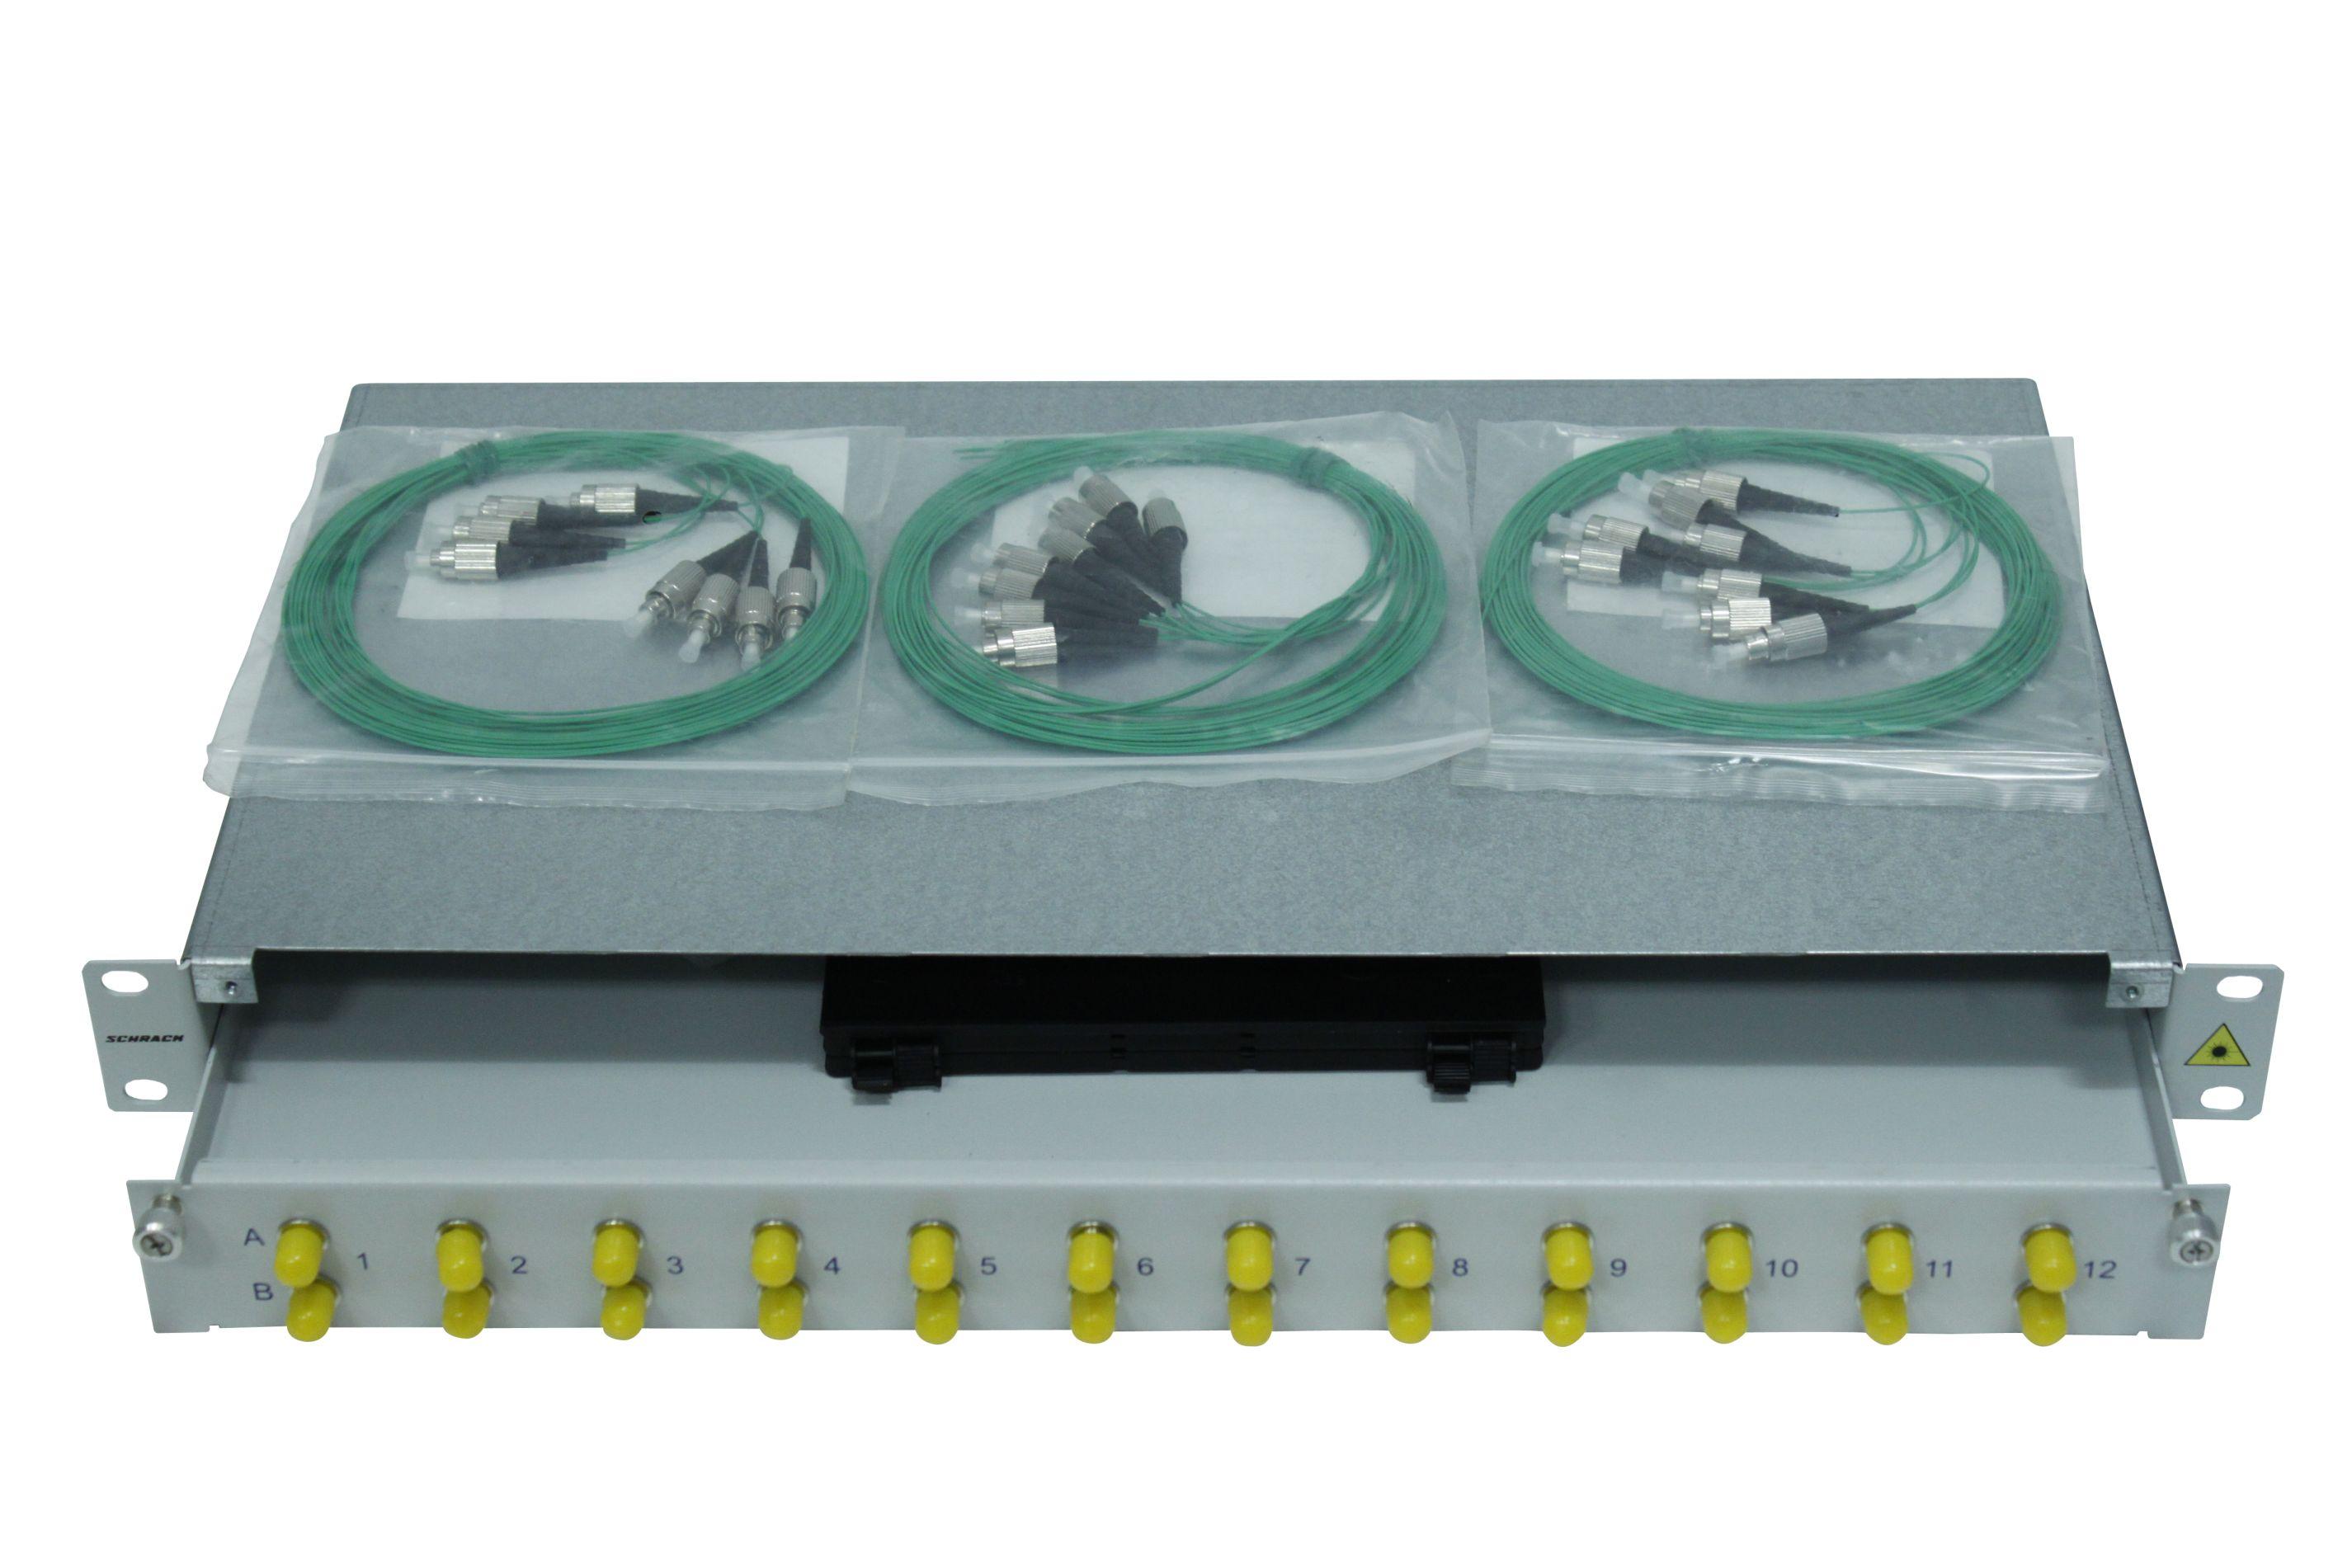 1 Stk LWL Spleißbox, 16Fasern, FC, 9/125µm OS2, 19, 1HE HSELS169FG